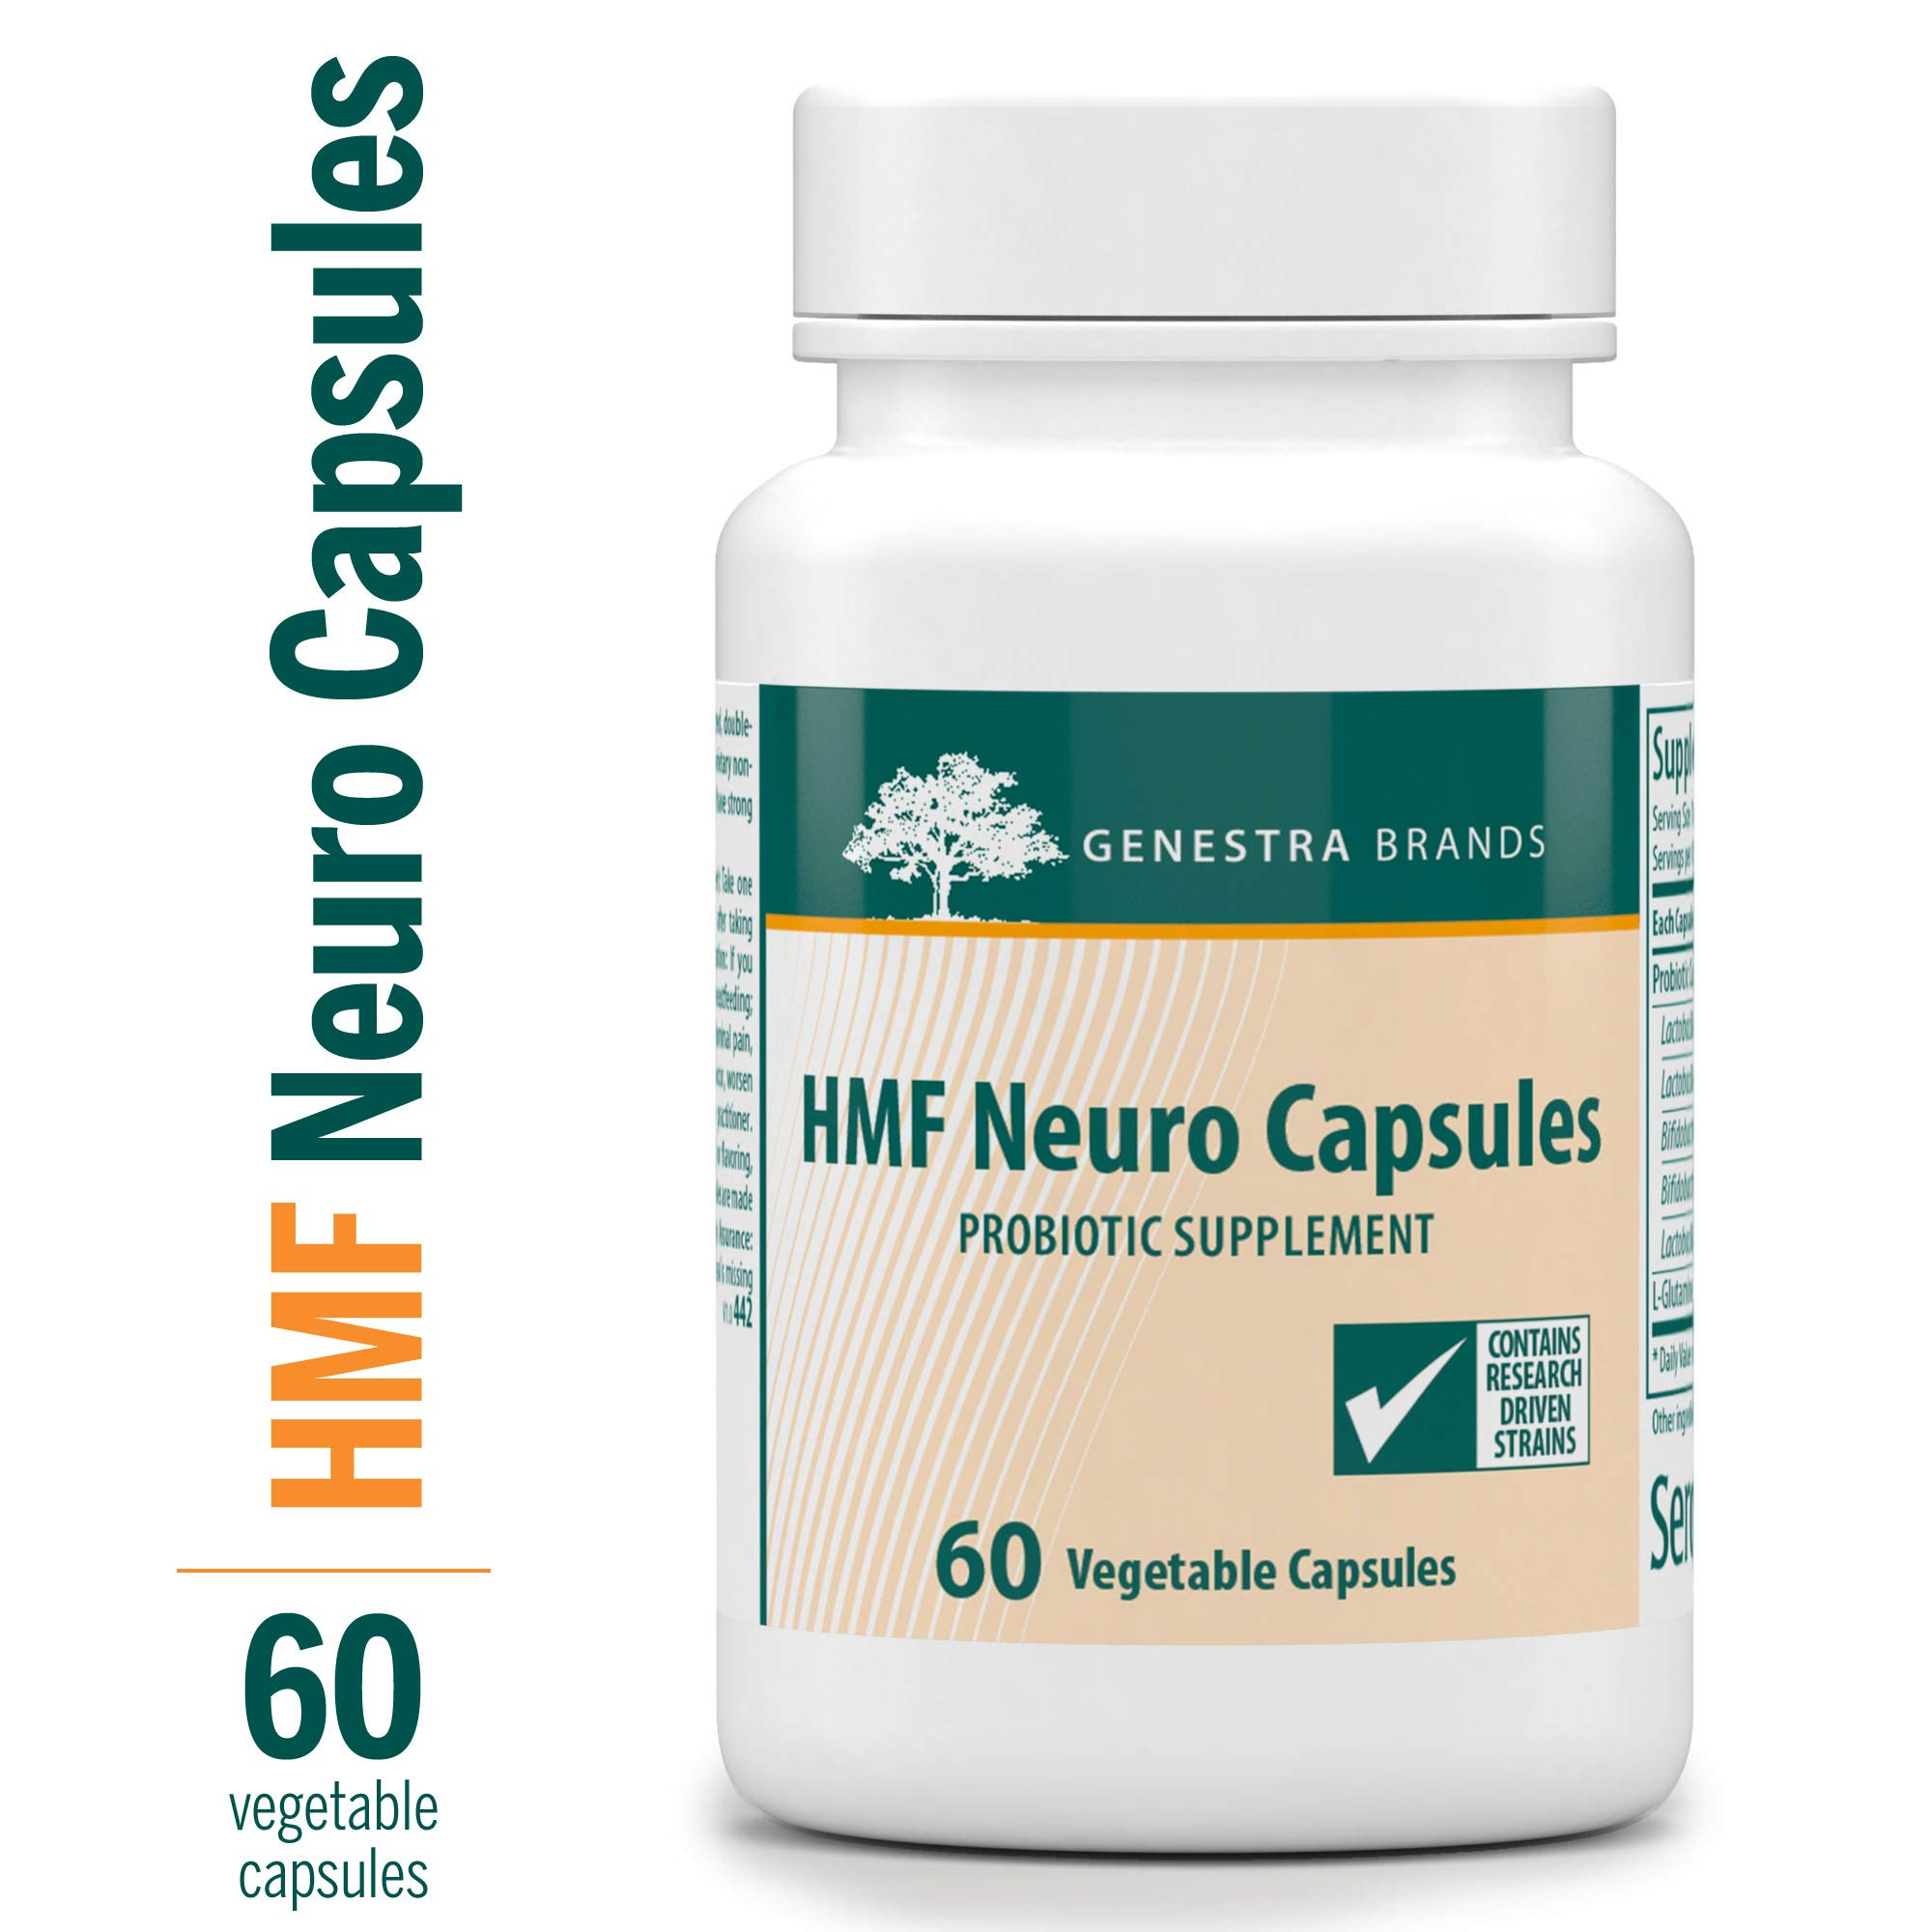 Genestra Brands - HMF Neuro Capsules - Probiotic and Amino Acid Formula - 60 Capsules by Genestra